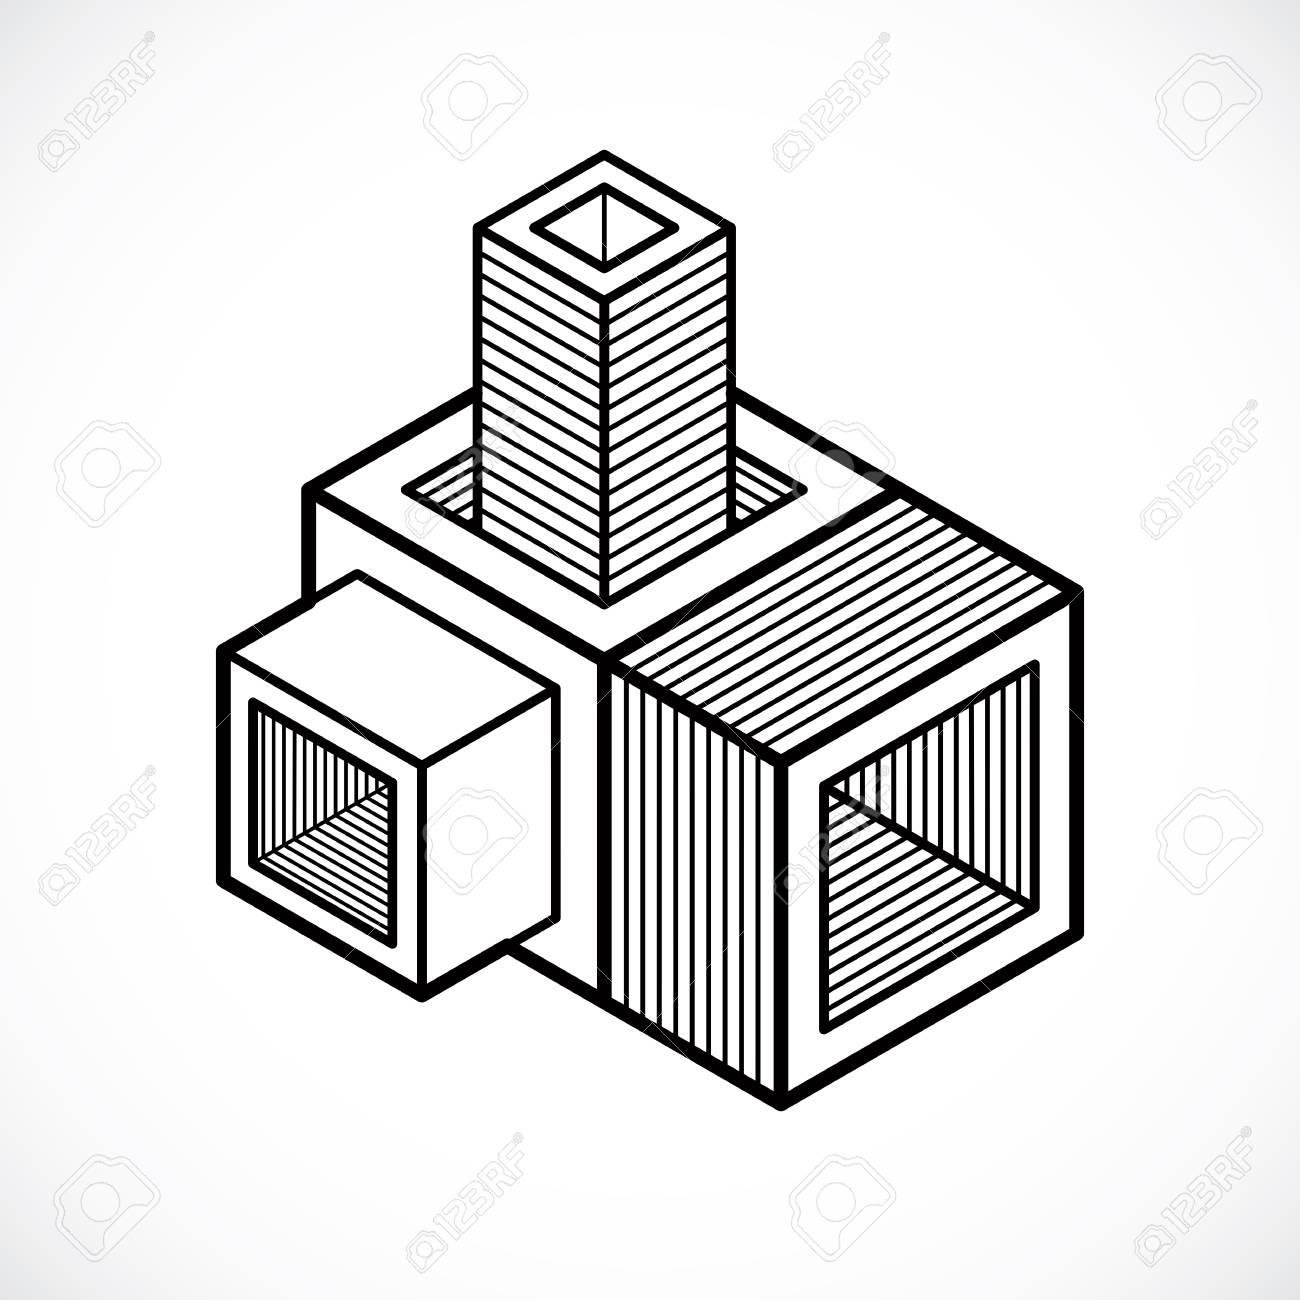 3d Cube Drawing At Getdrawings